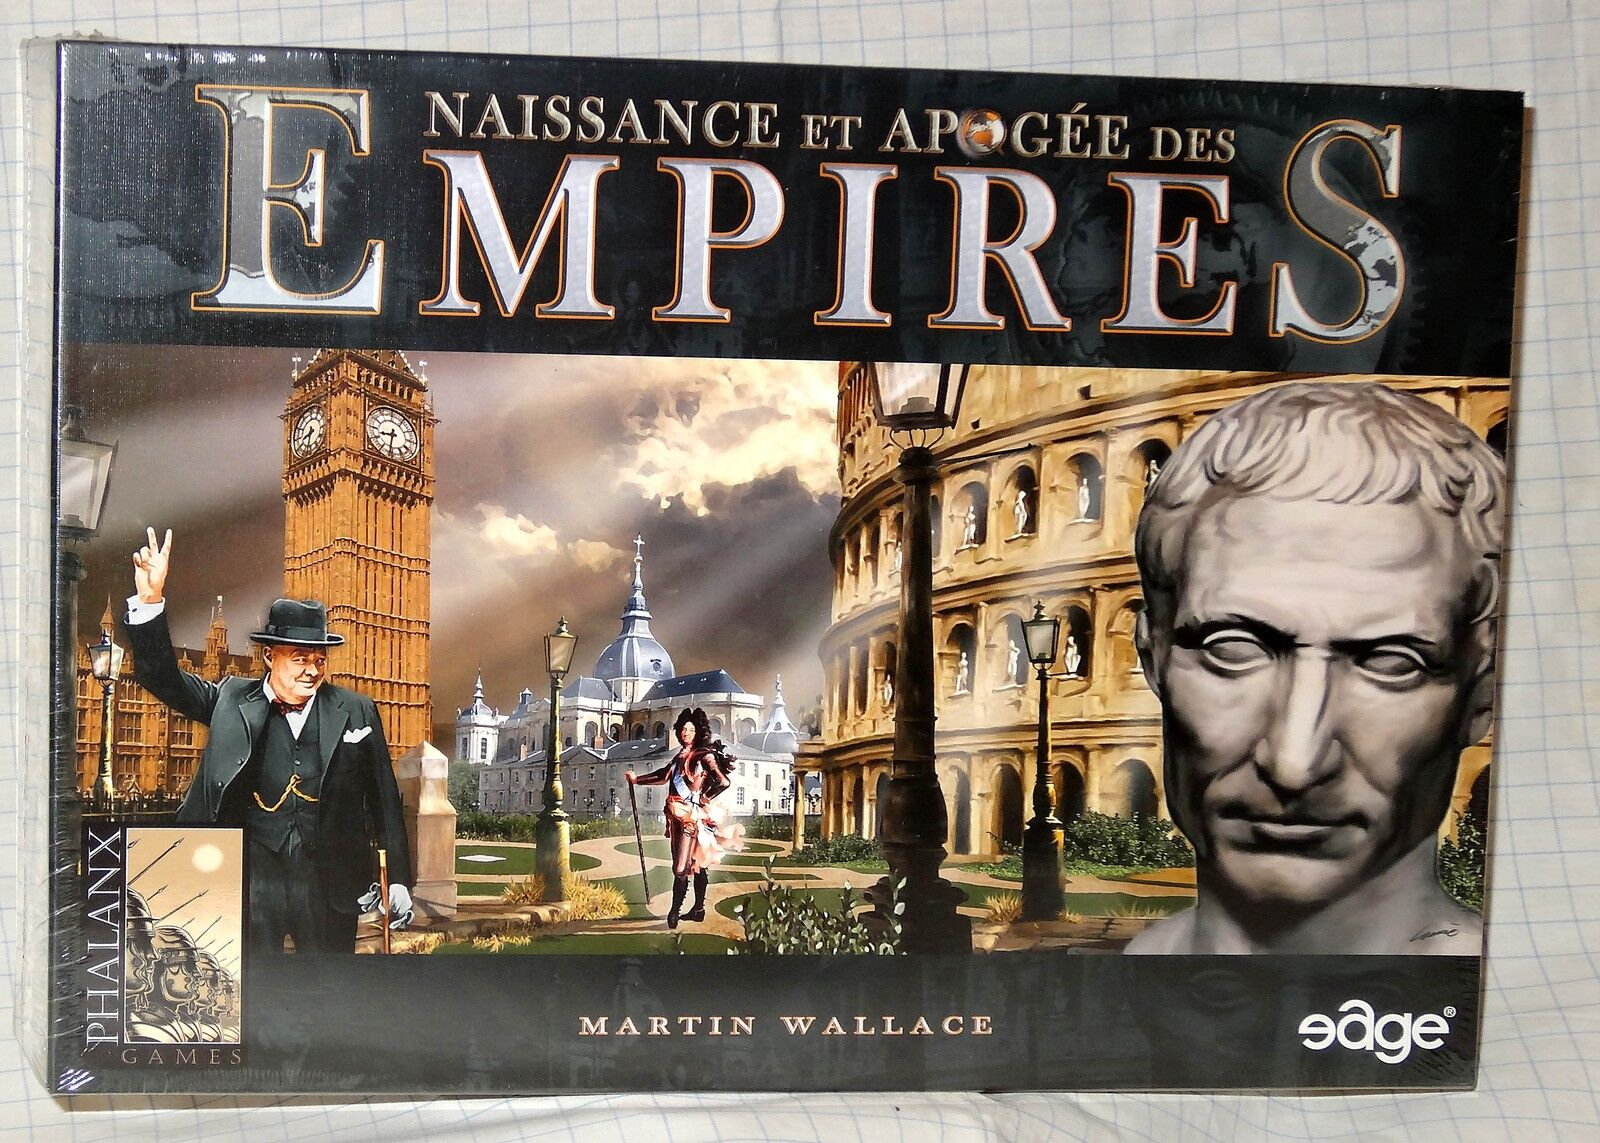 EDGE   NAISSANCE & APOGEE DES EMPIRES VERSION FRANCAISE NEUF